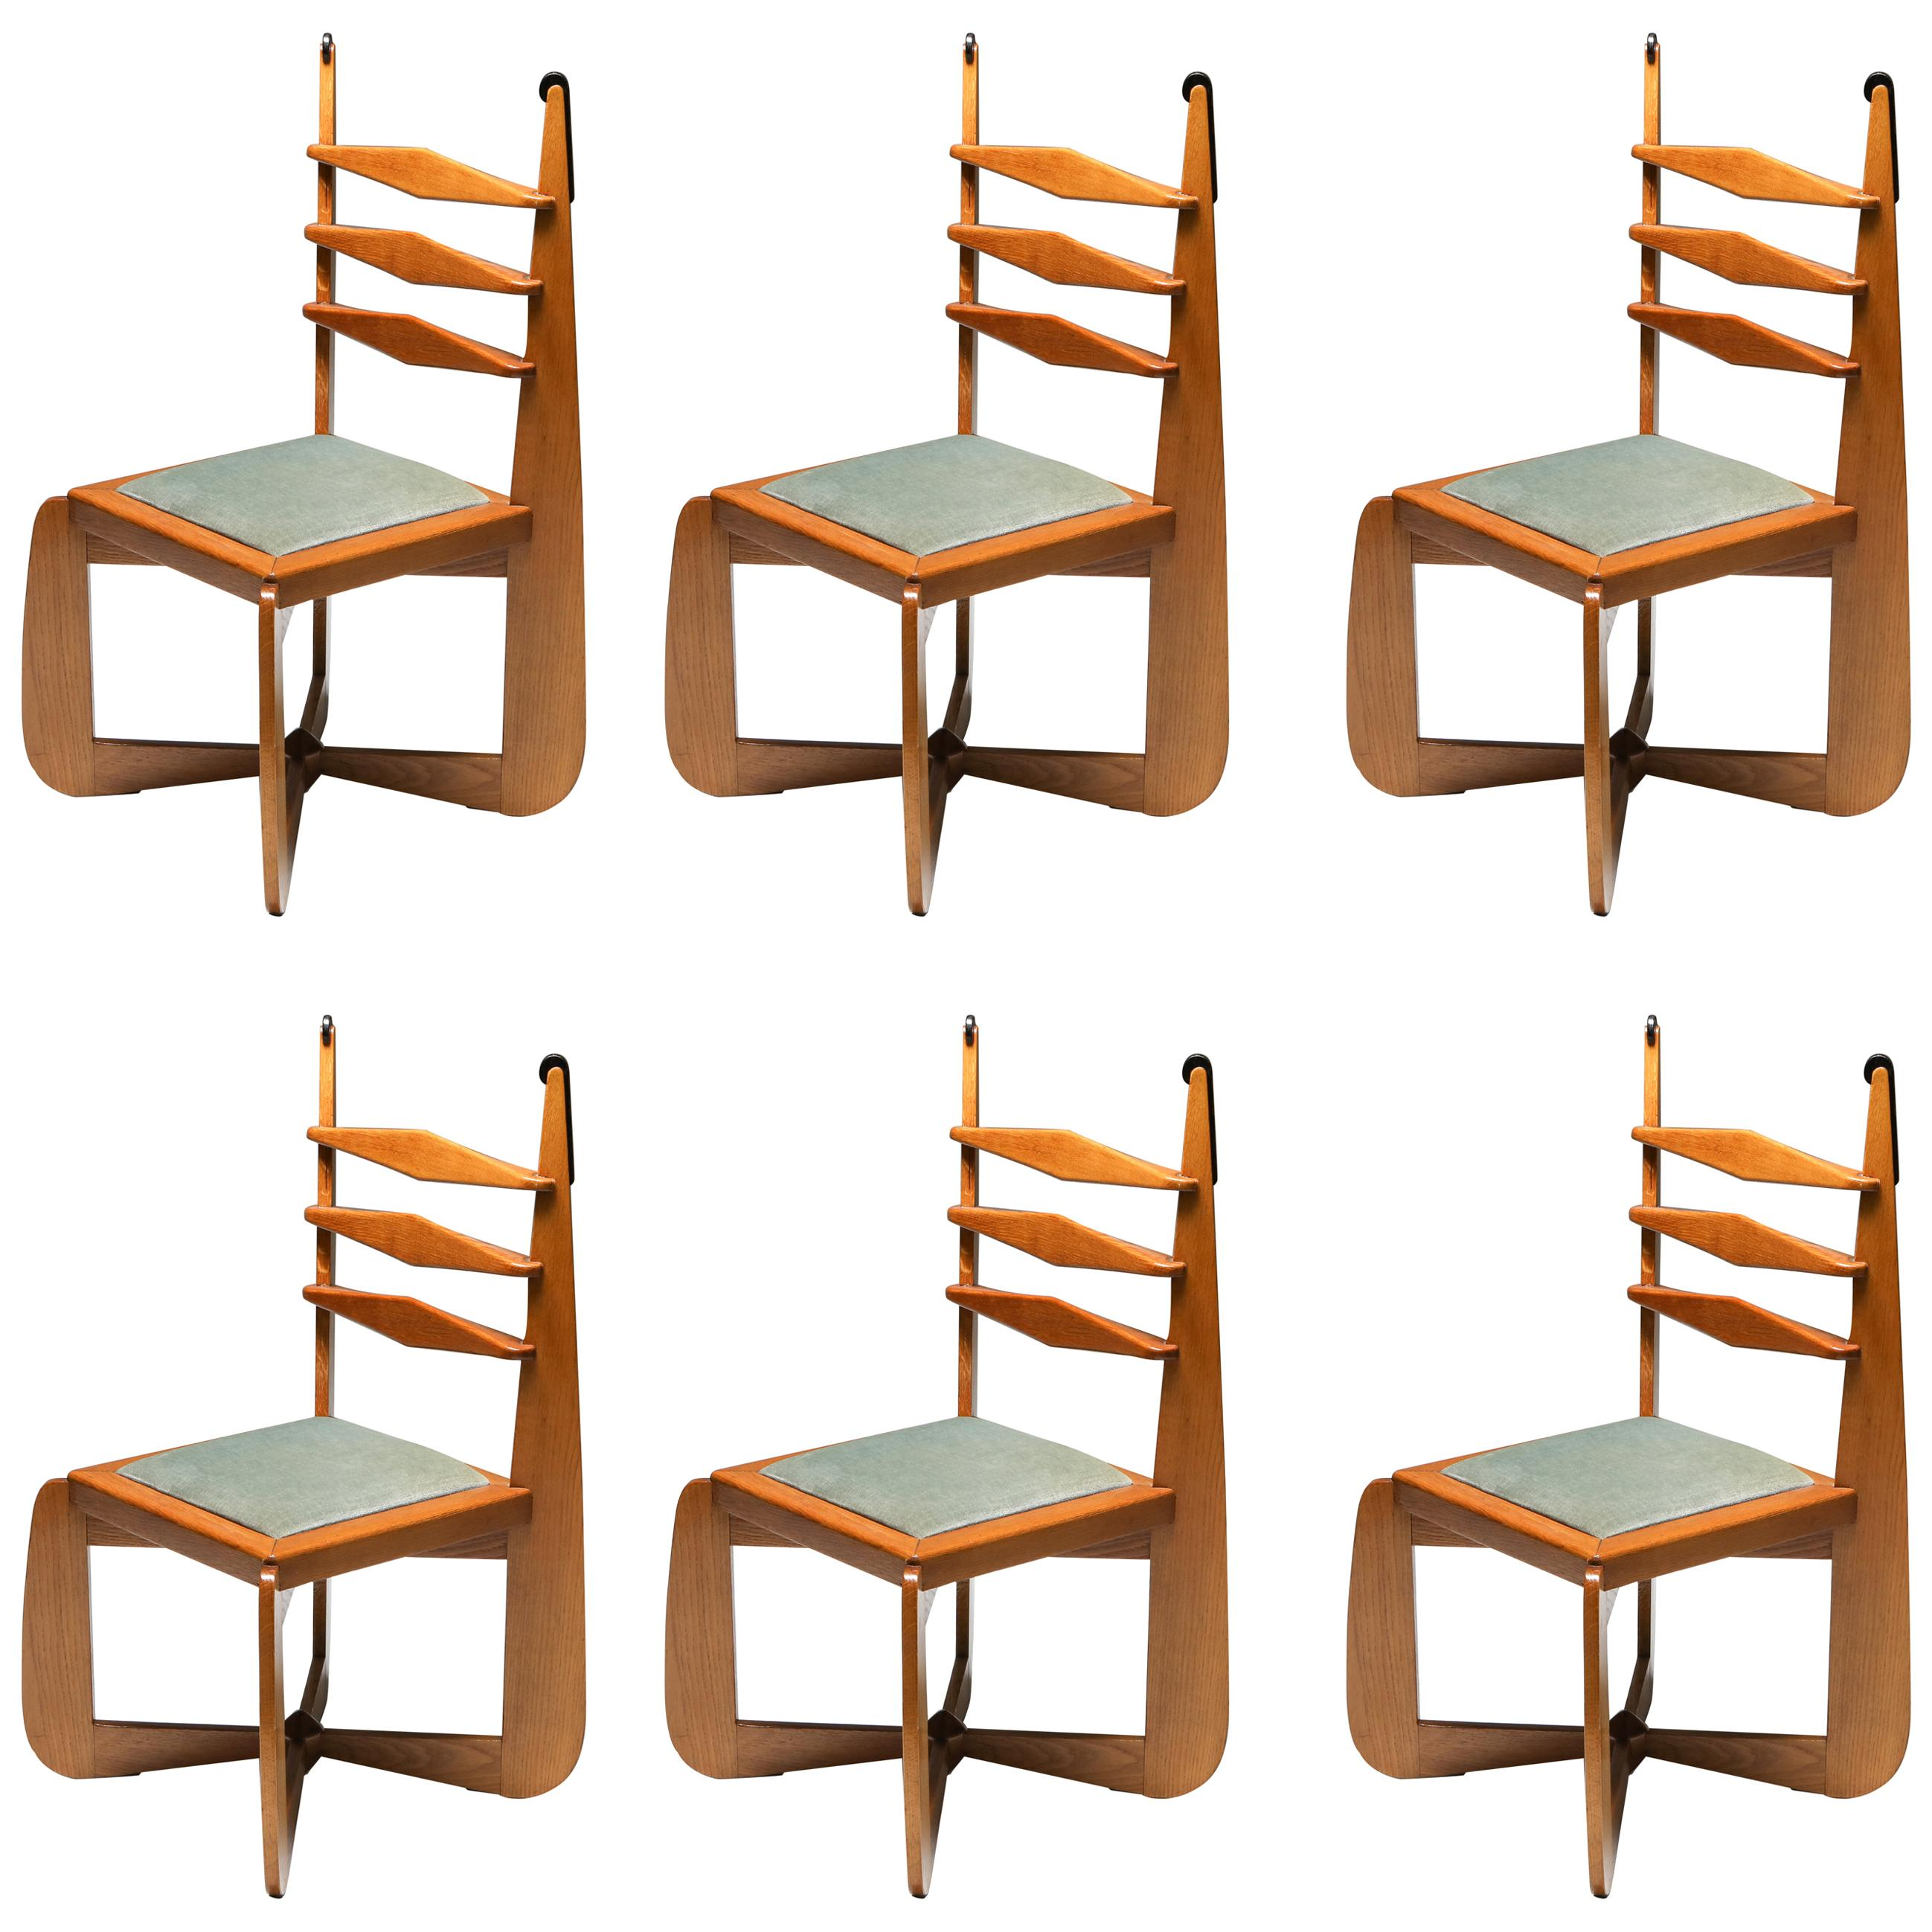 Amsterdam School Dutch Art Deco Expressive Chairs in Oak, Set of Six